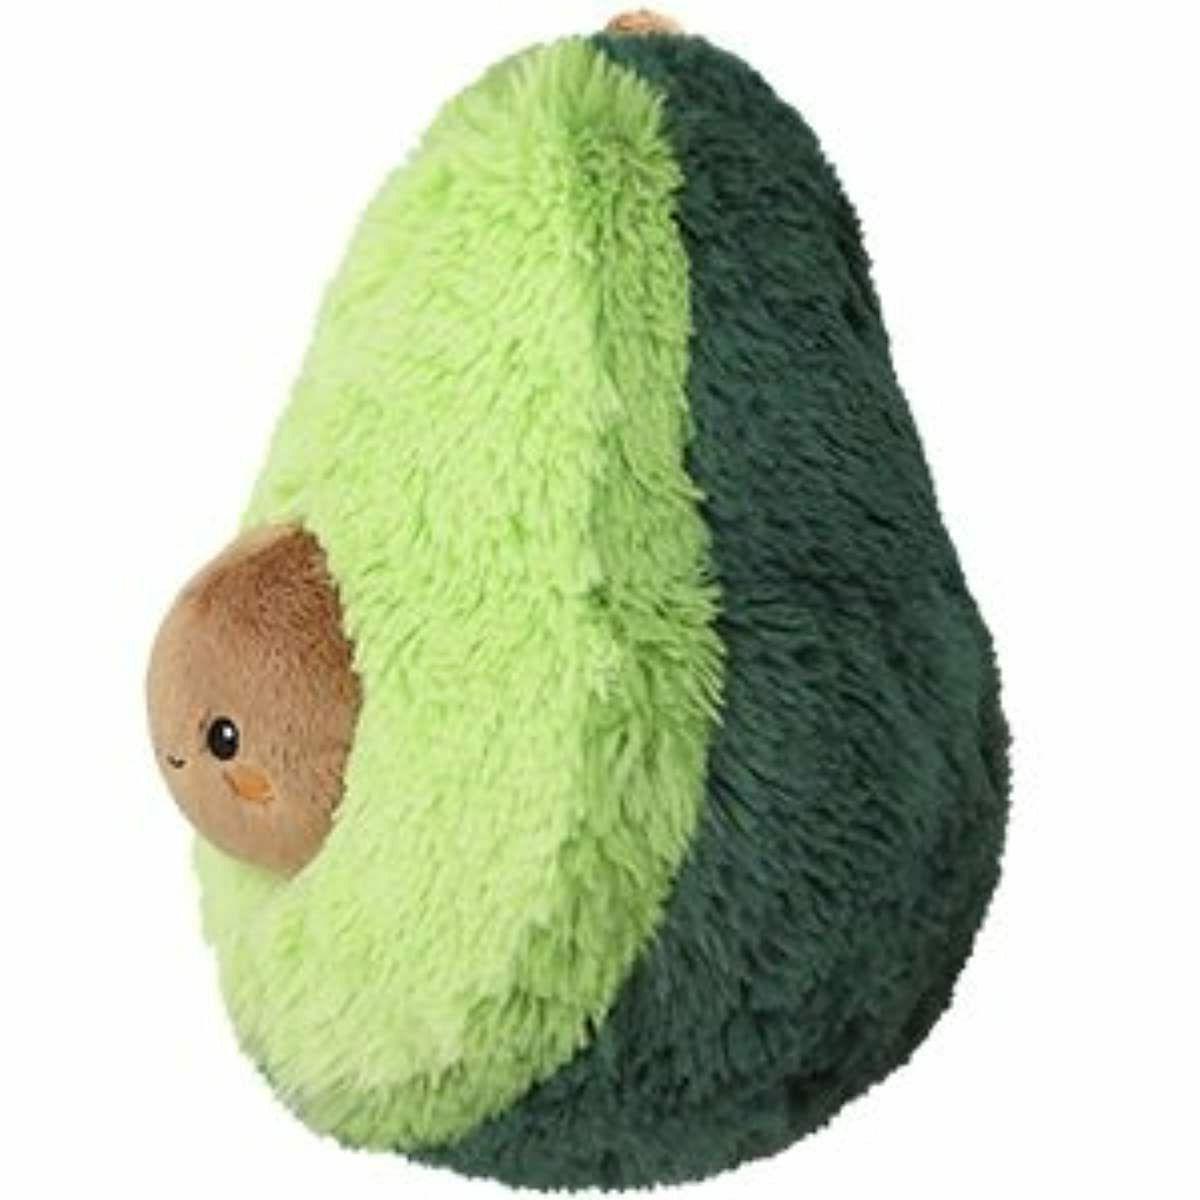 Mini Comfort 7¨ Squishable Toy